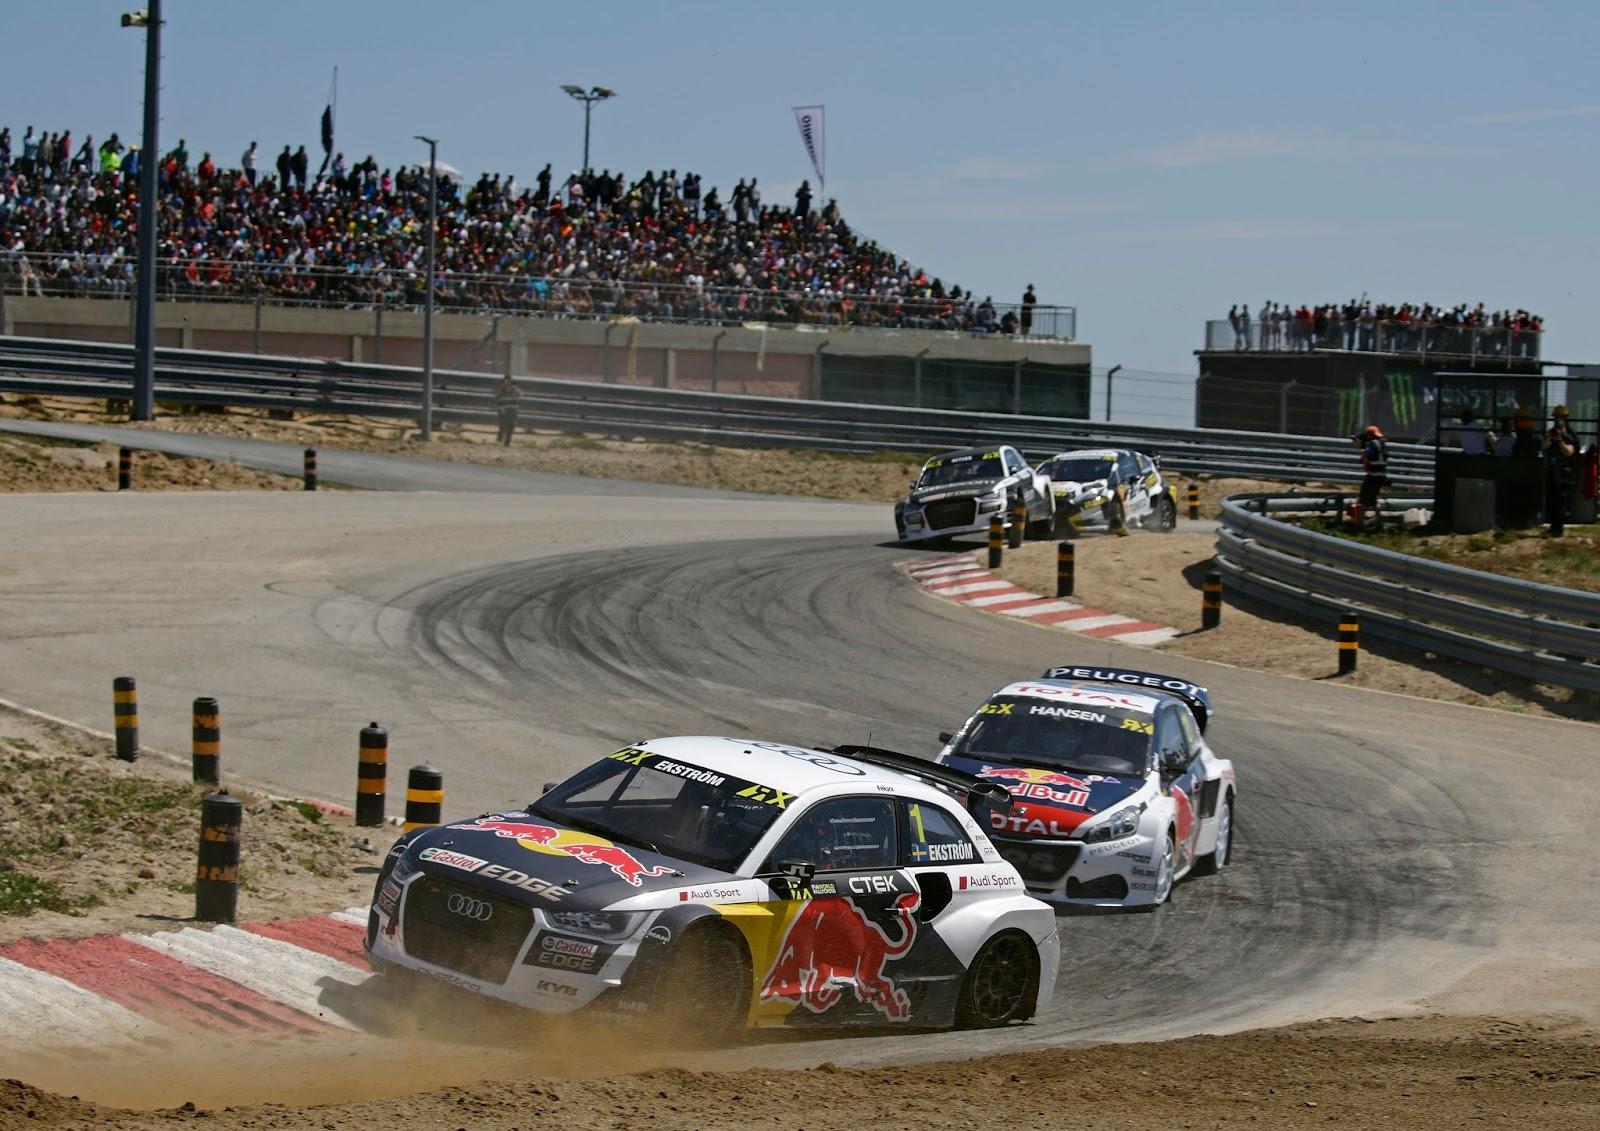 A173390 large Δες όλο τον αγώνα του συναρπαστικού Rallycross FIA, FIA World Rallycross Championship, Rally, videos, World RX